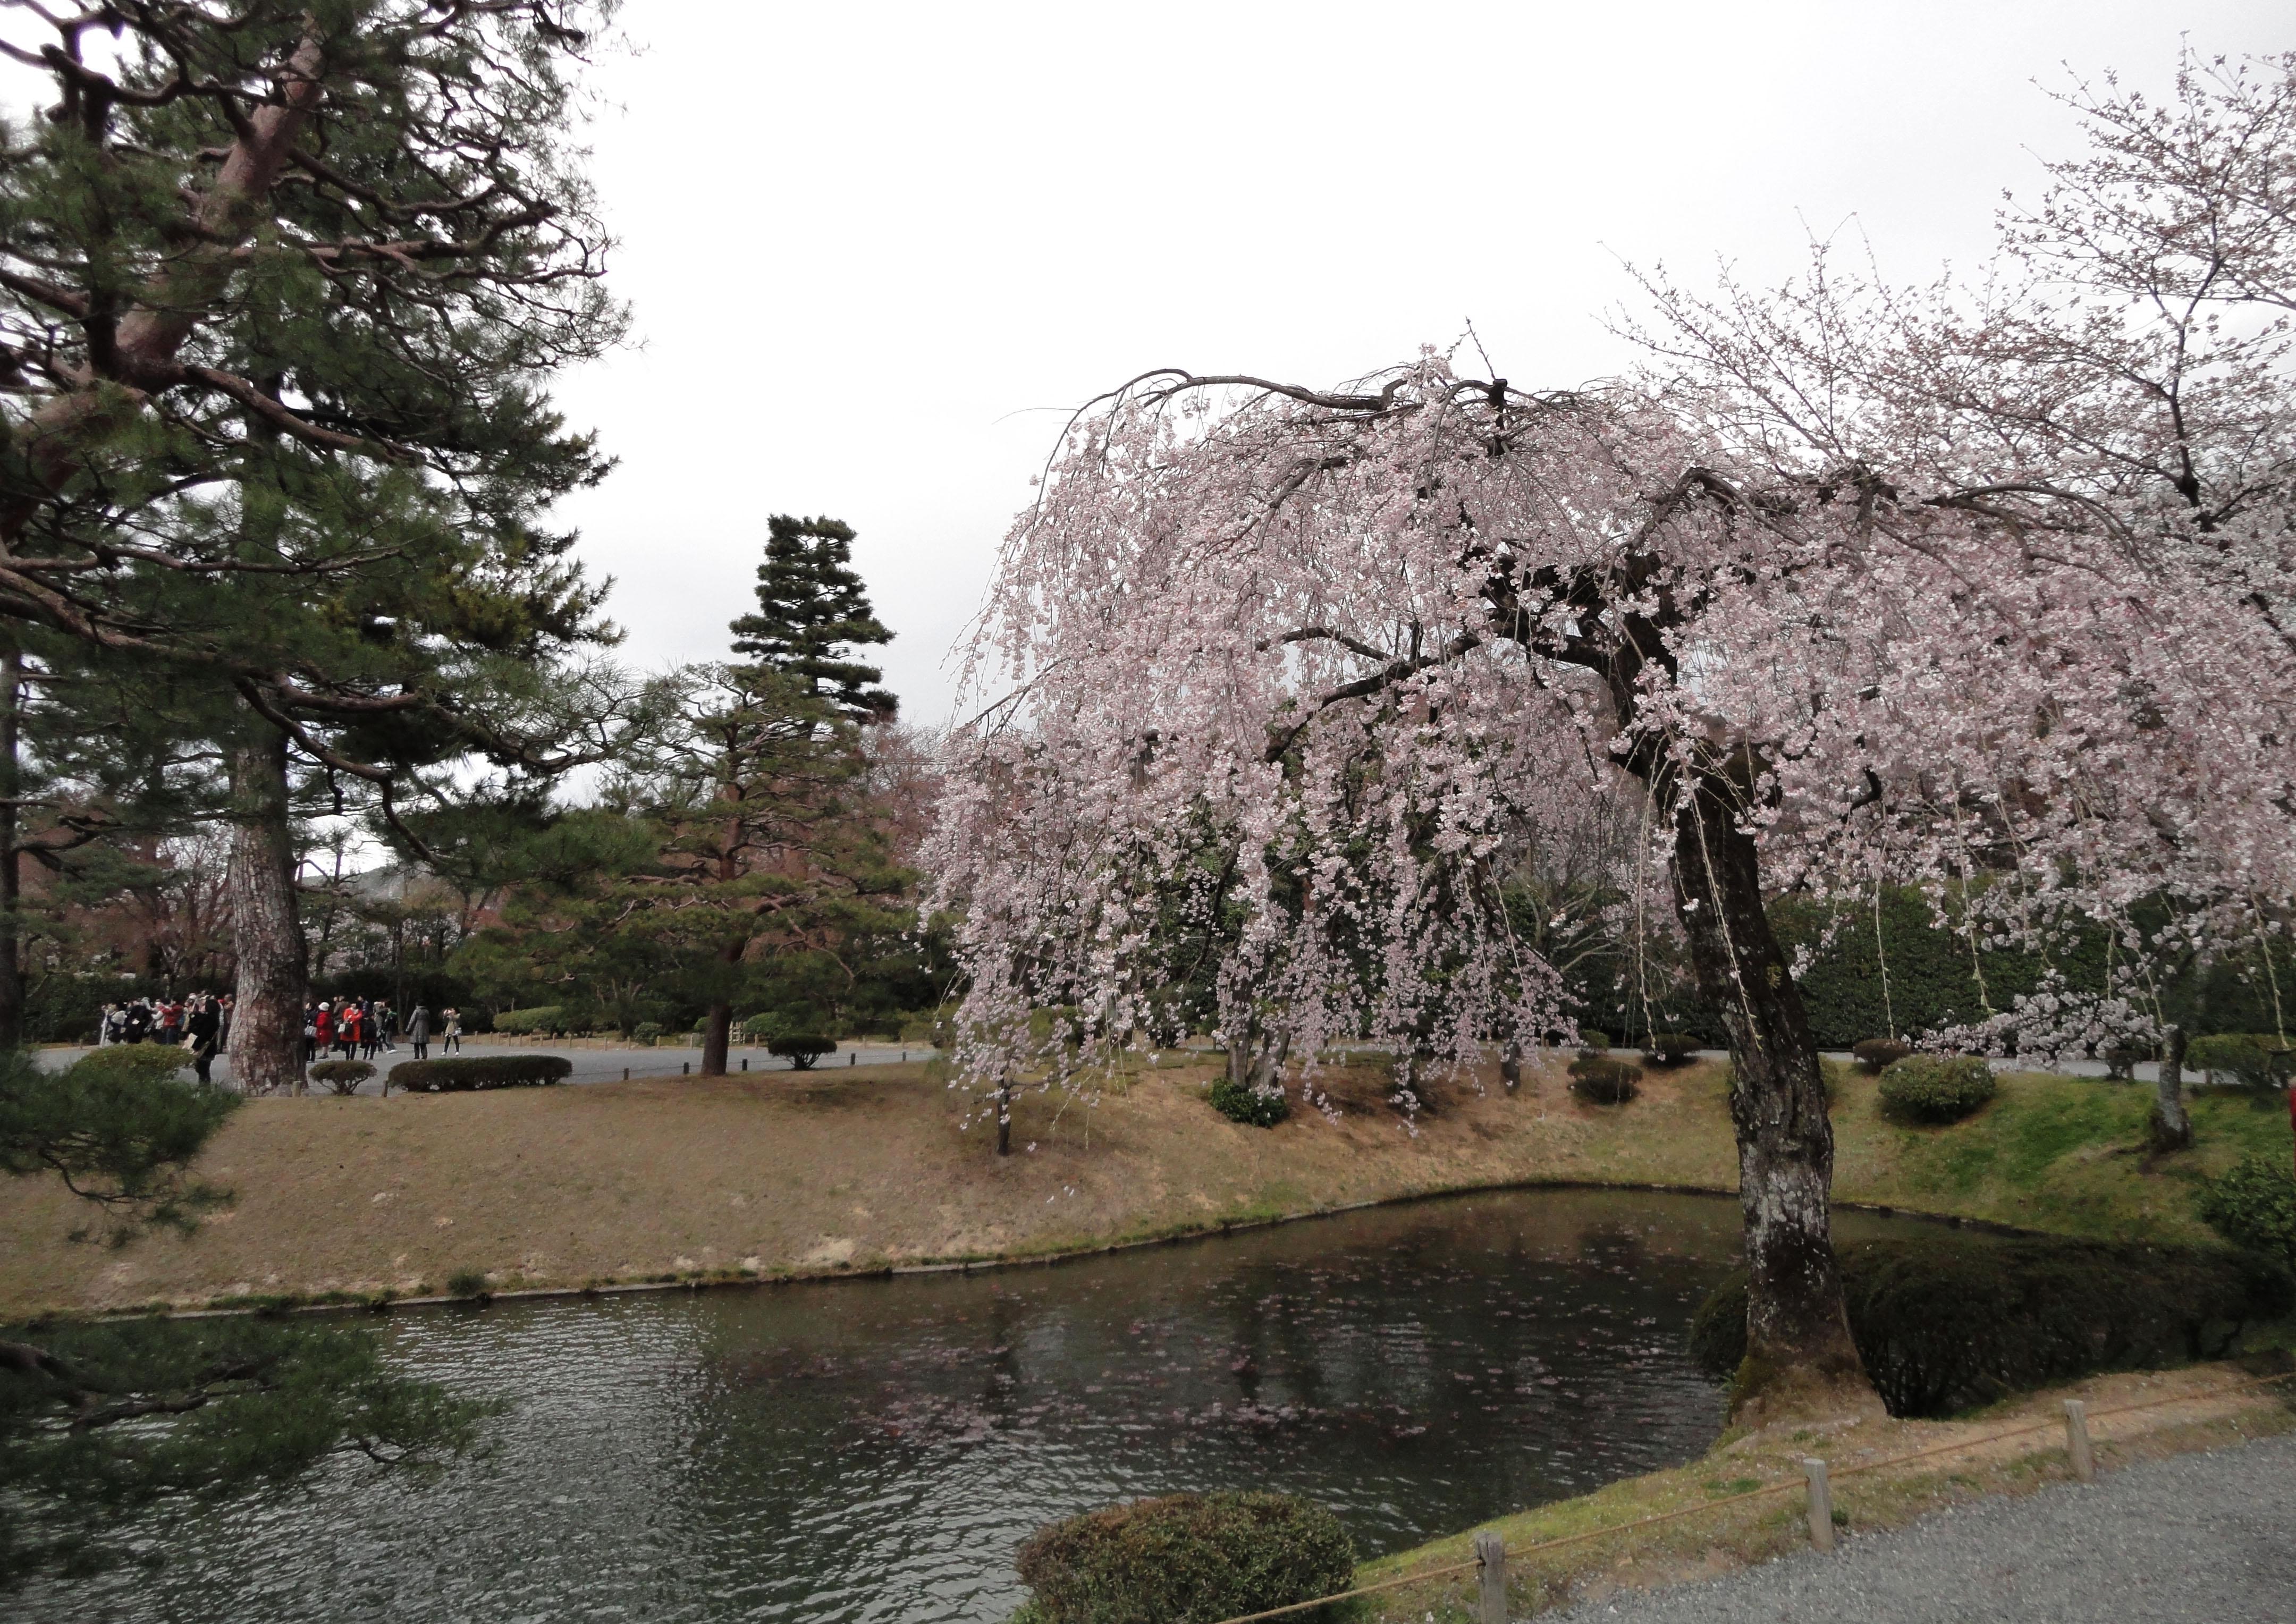 Cherry tree blossoms Byodo in temple Jodo shiki garden Kyoto Japan 01